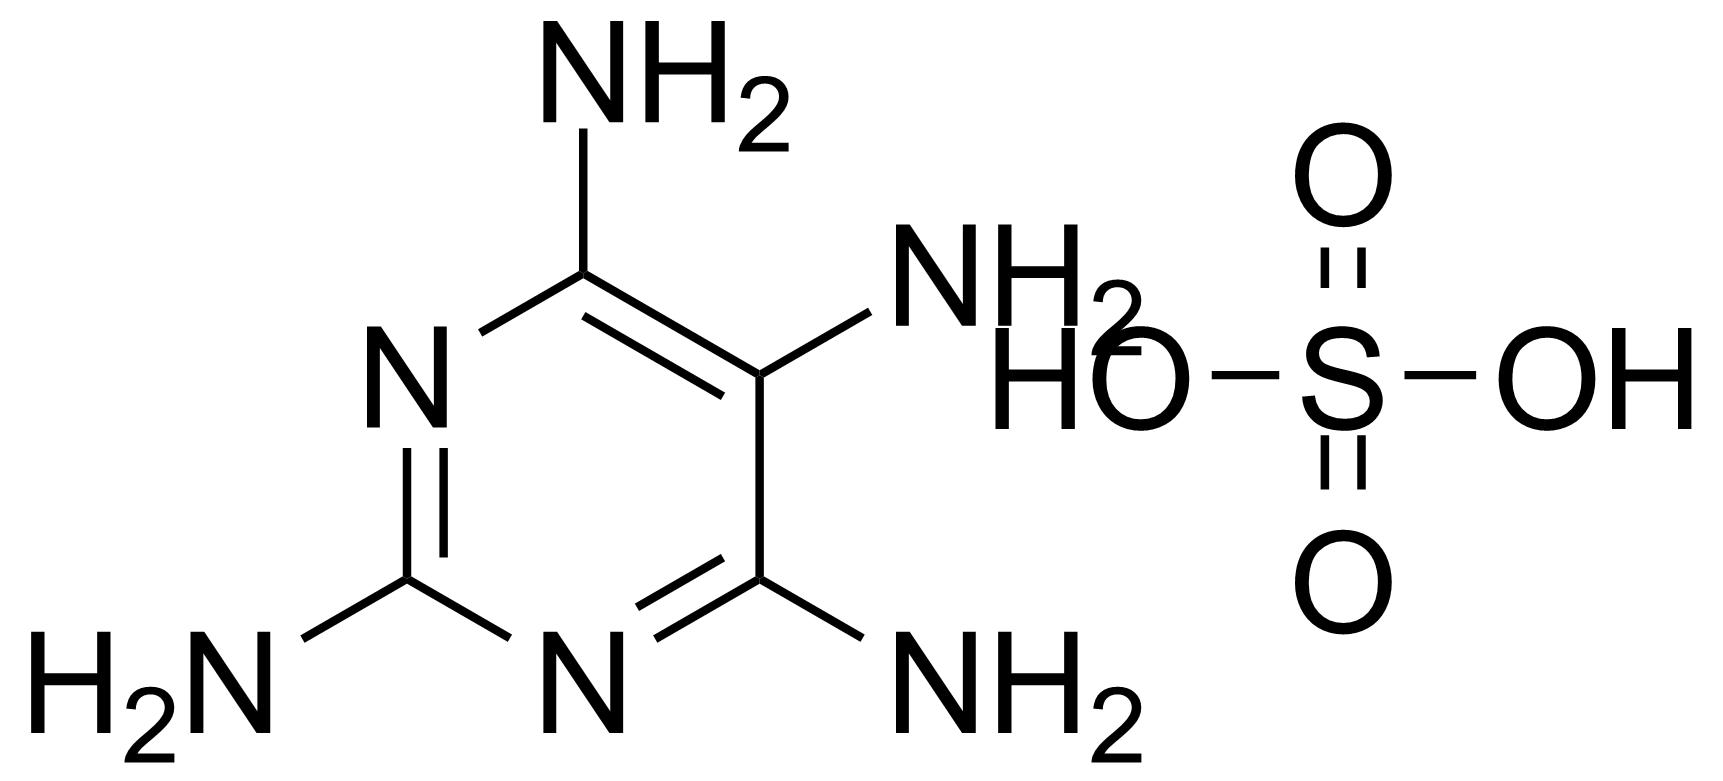 Structure of 2,4,5,6-Tetraaminopyrimidine sulfate